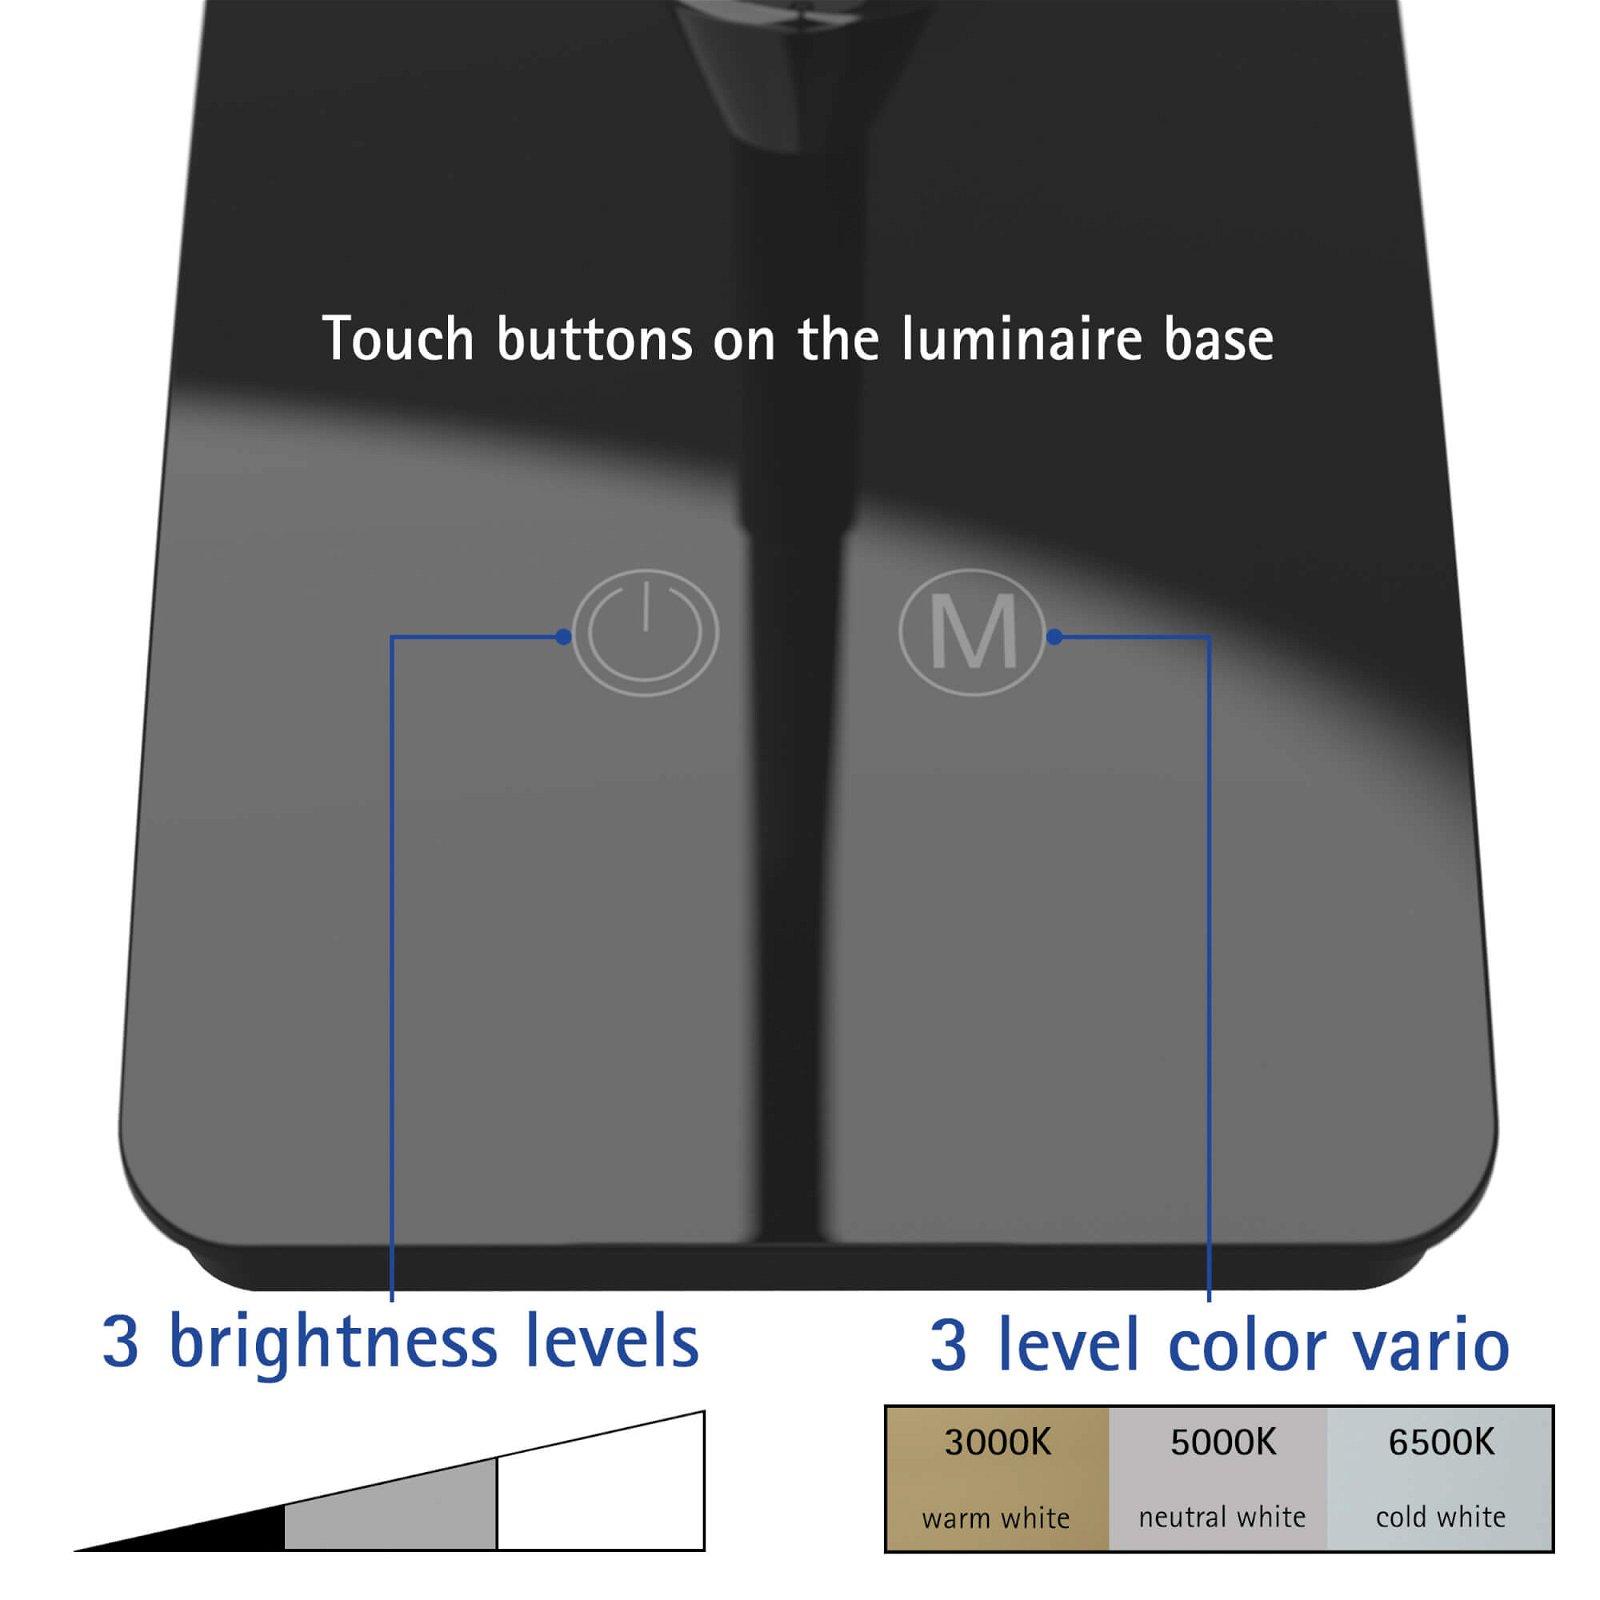 LED-Tischleuchte MAULpearly colour vario